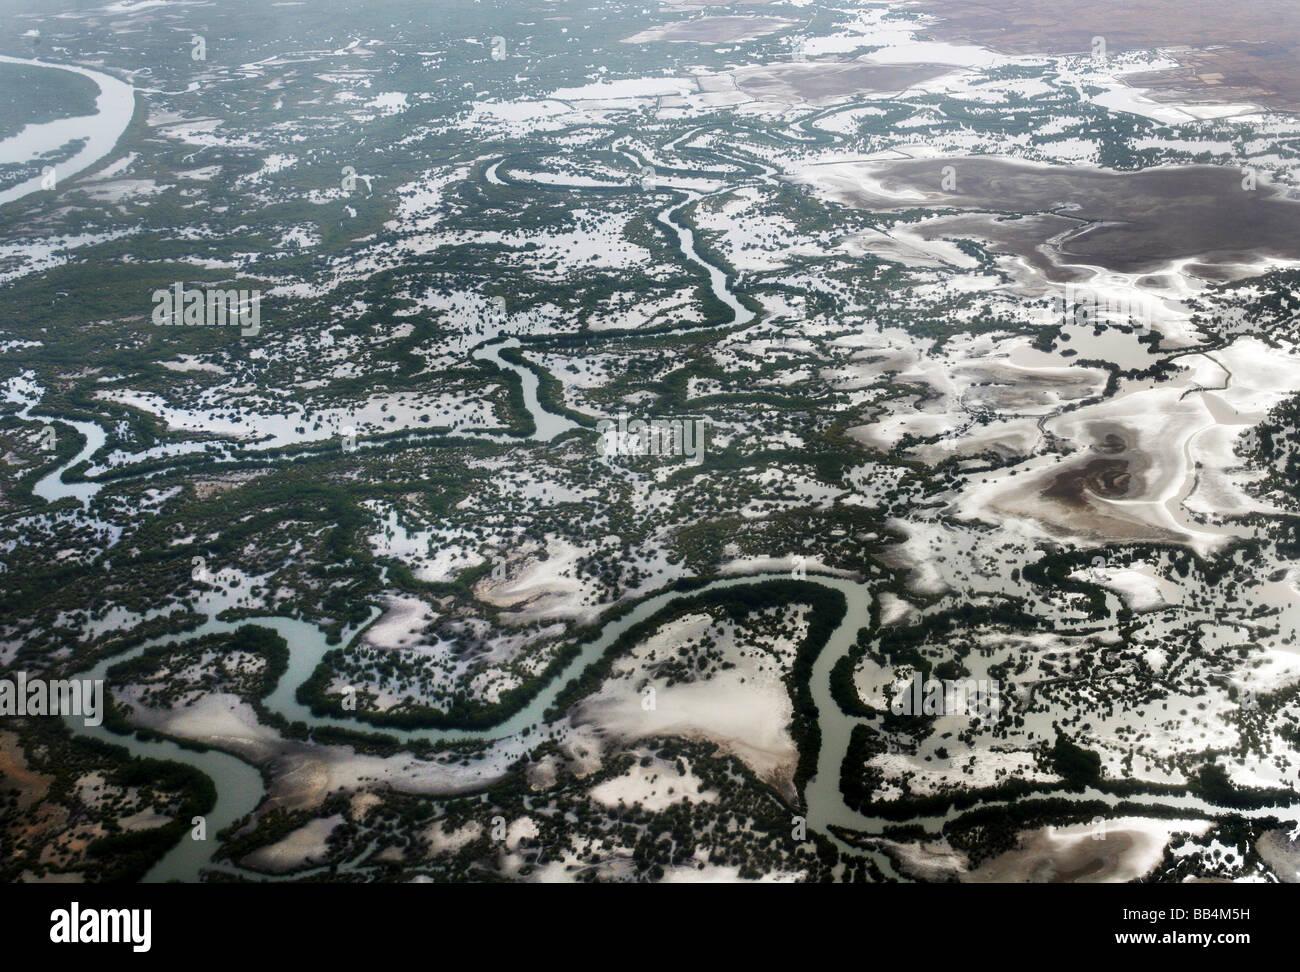 Vista aérea del Delta del río Casamance, cerca de Ziguinchor, Senegal Imagen De Stock